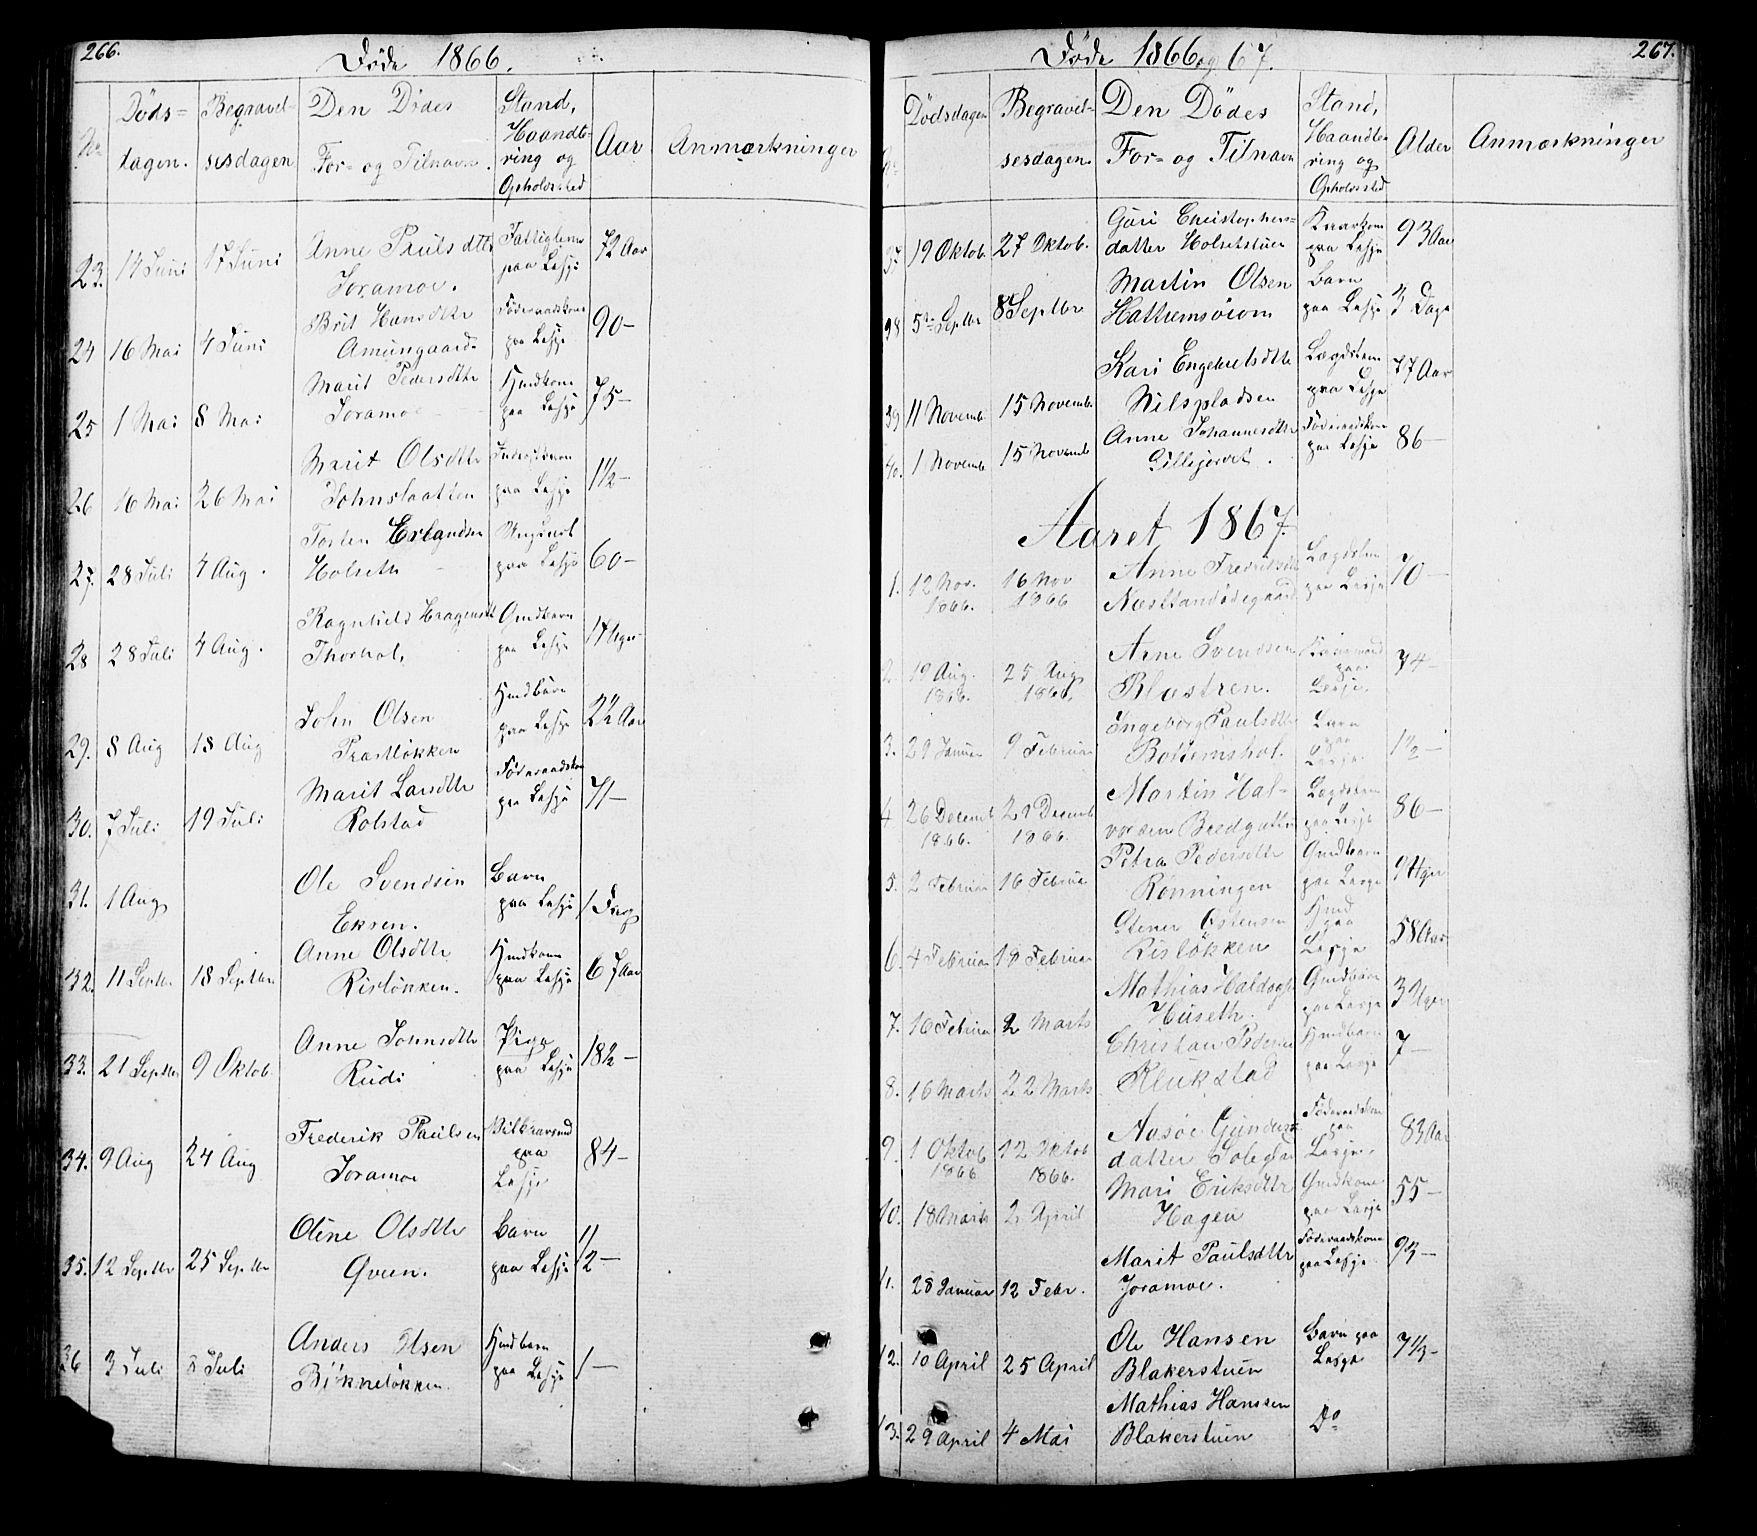 SAH, Lesja prestekontor, Klokkerbok nr. 5, 1850-1894, s. 266-267